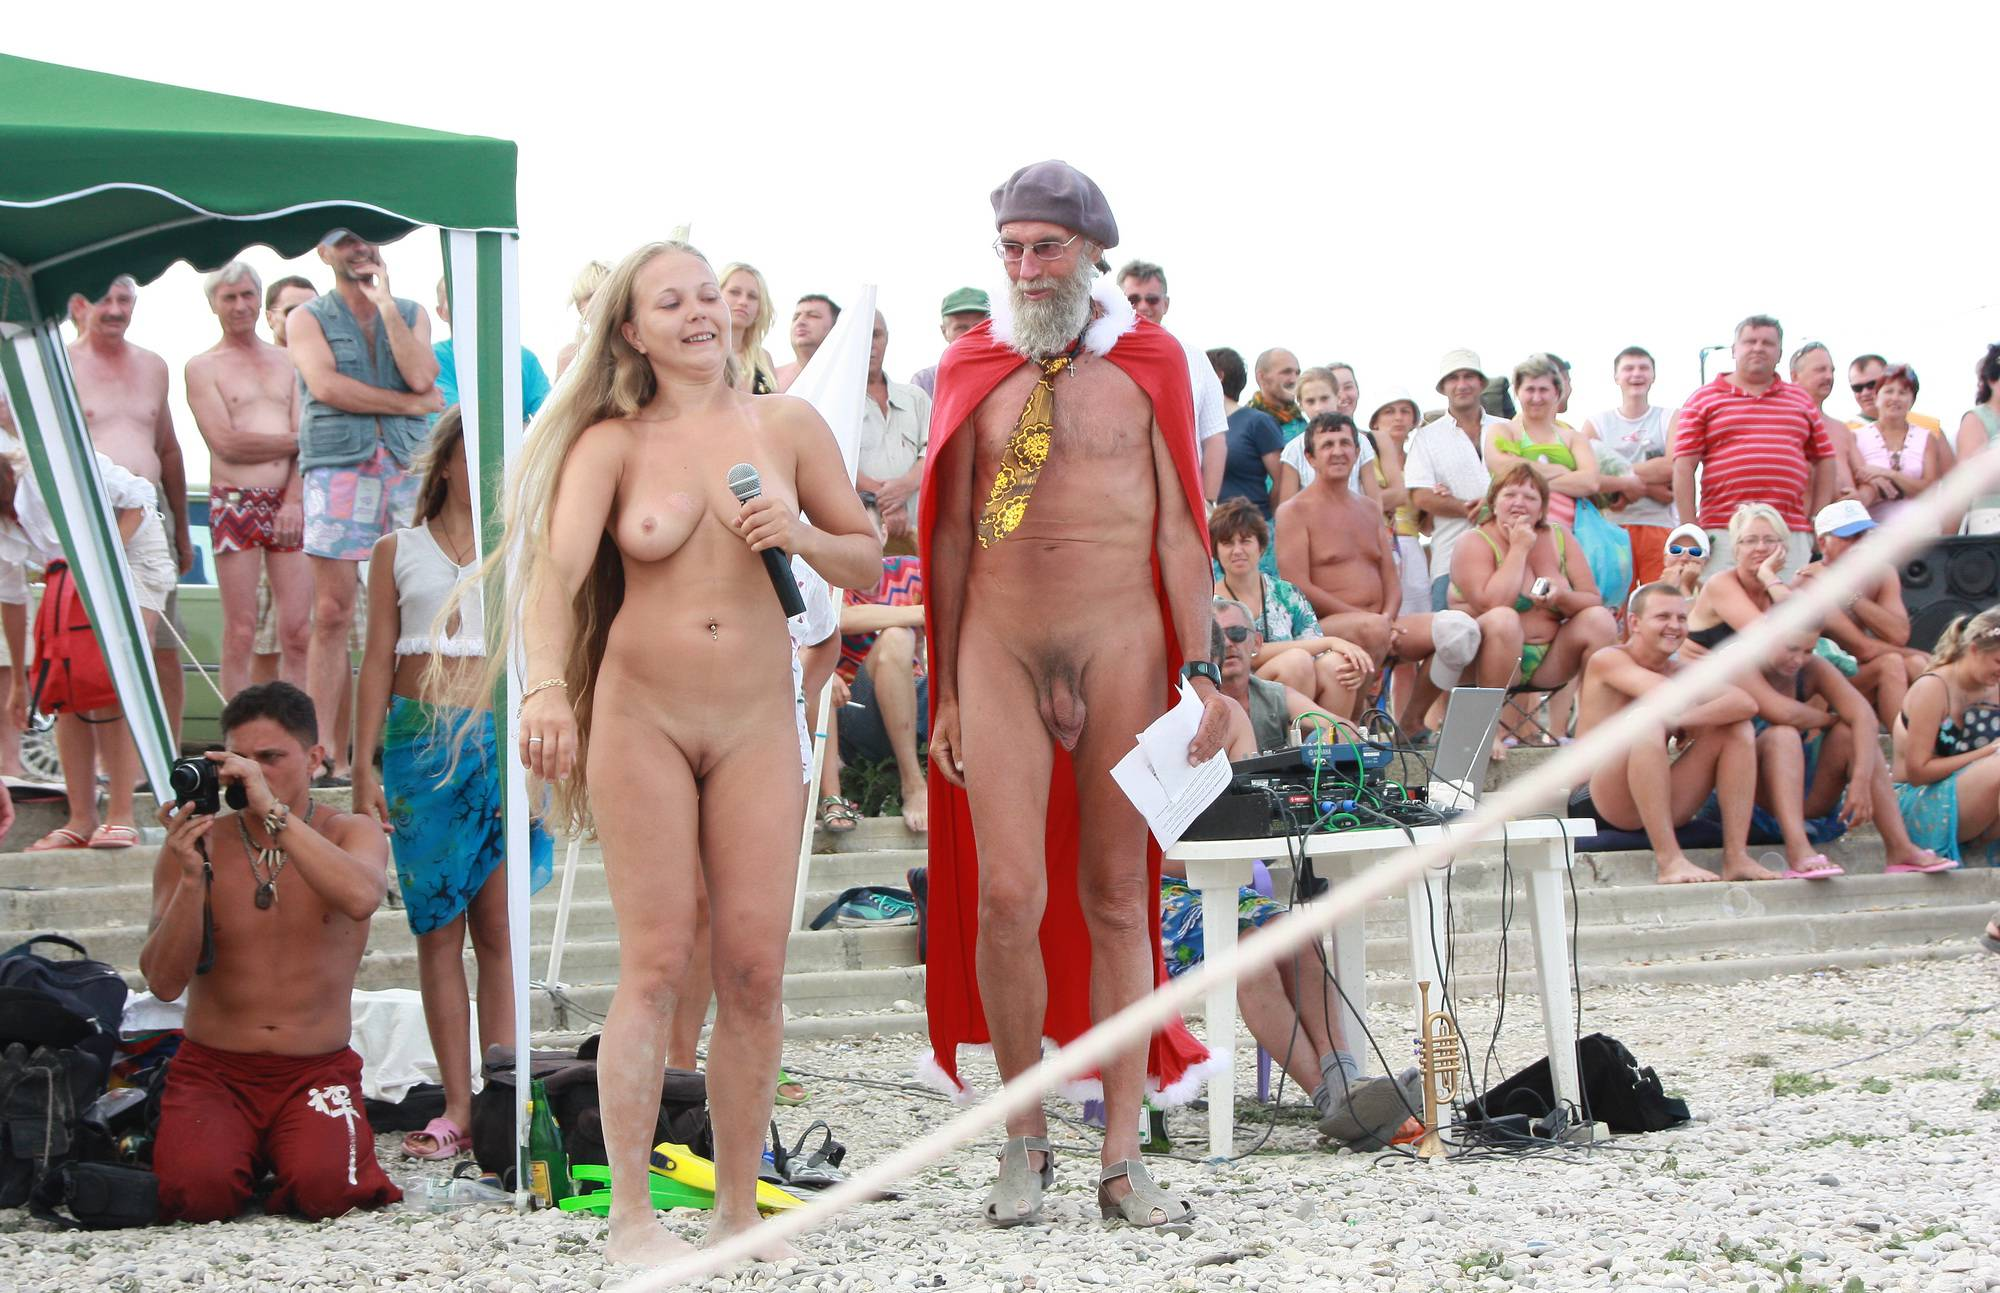 Nudist Pics Neptune Green Dance - 1